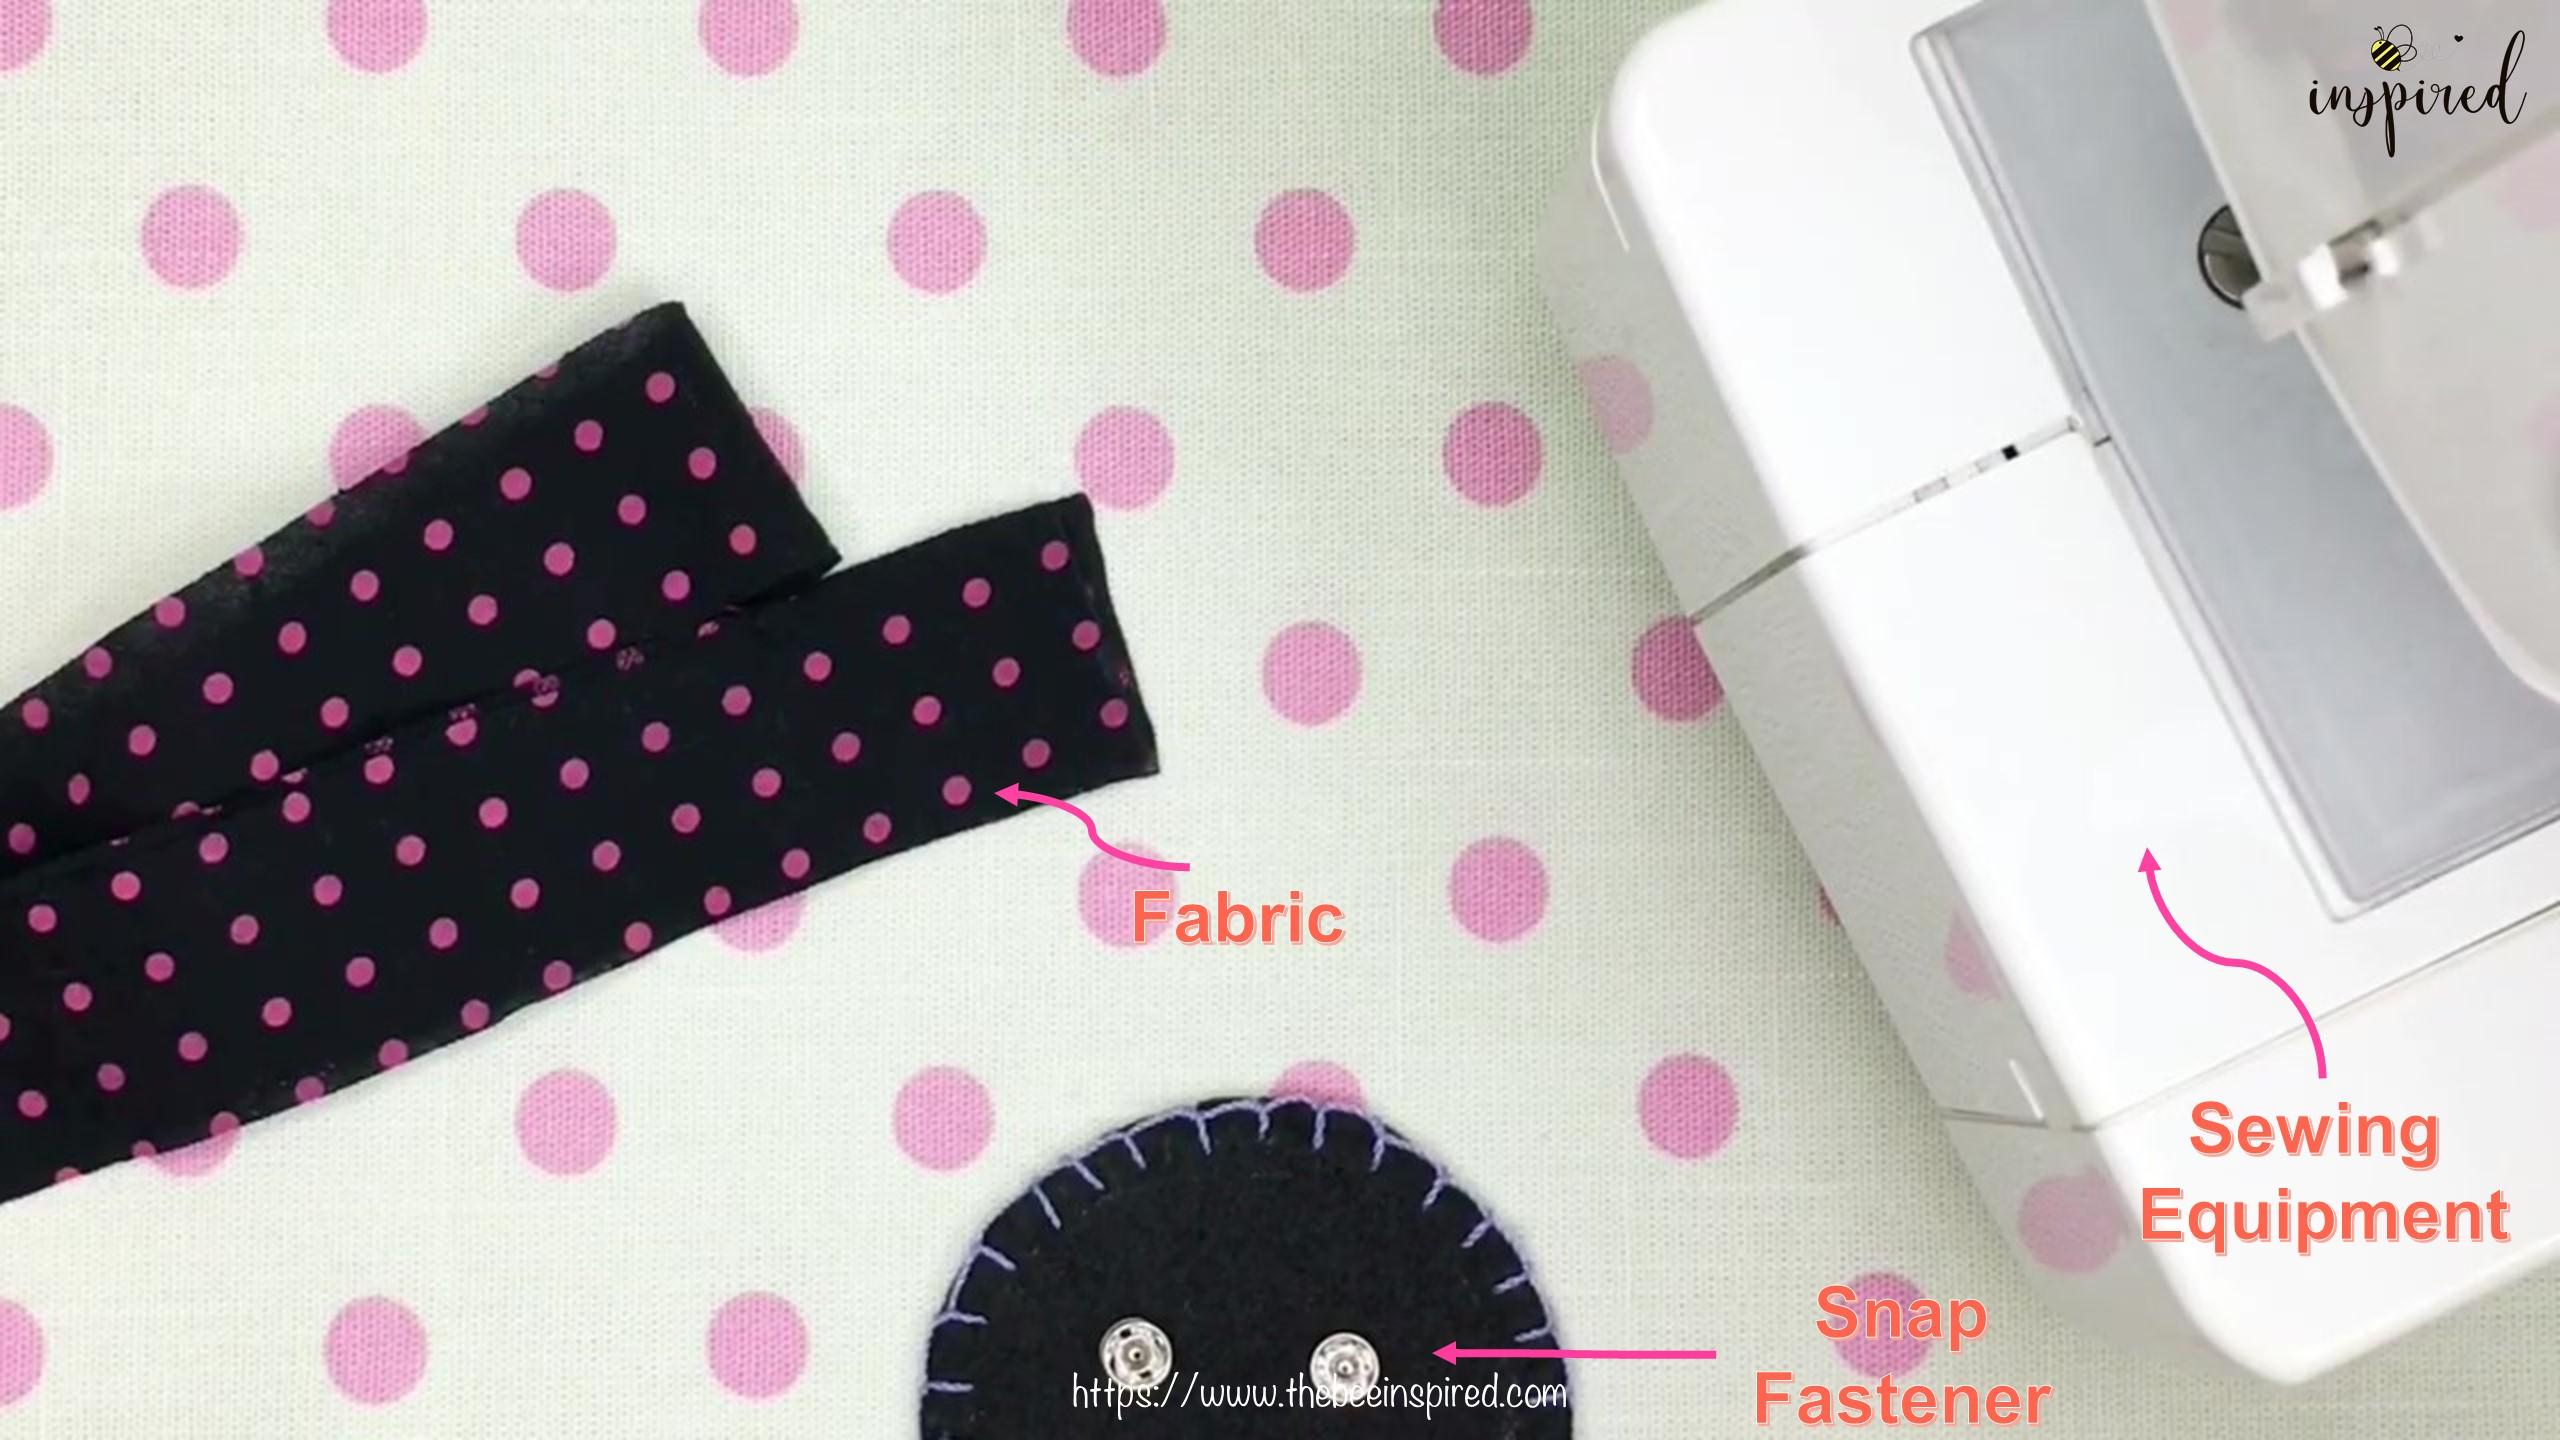 DIY สายคล้องแมสด้วยผ้าราคา 0 บาท _ How to Make Fabric Mask Strap with zero budget!_Equipment